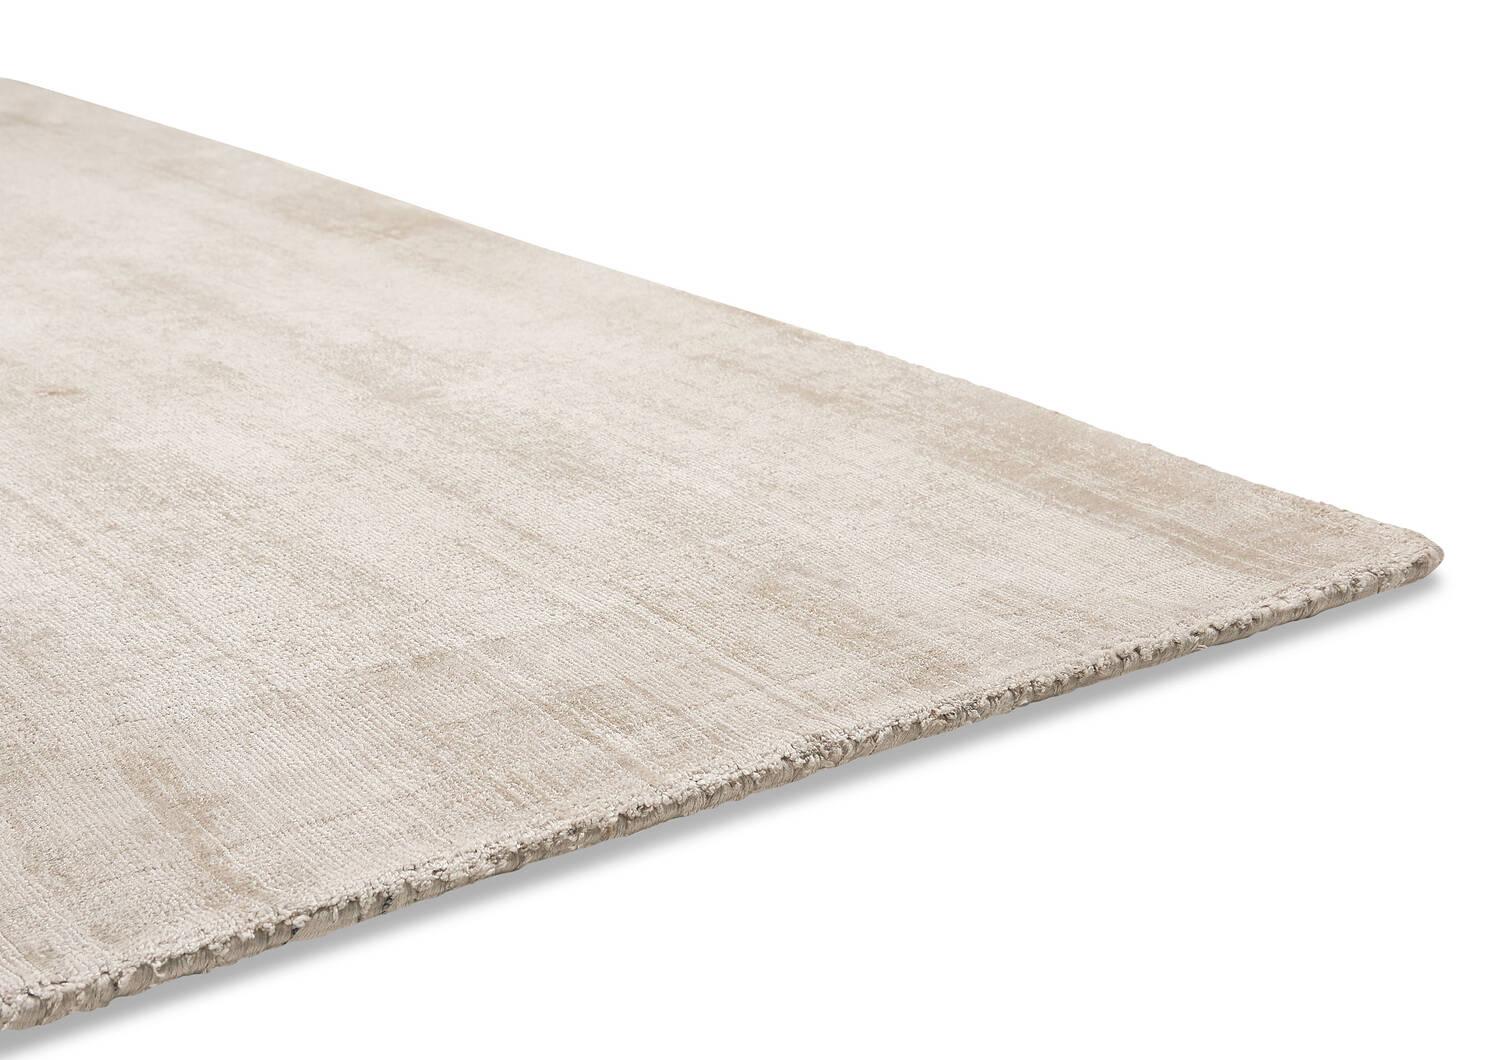 Antique Rug 60x96 Sand